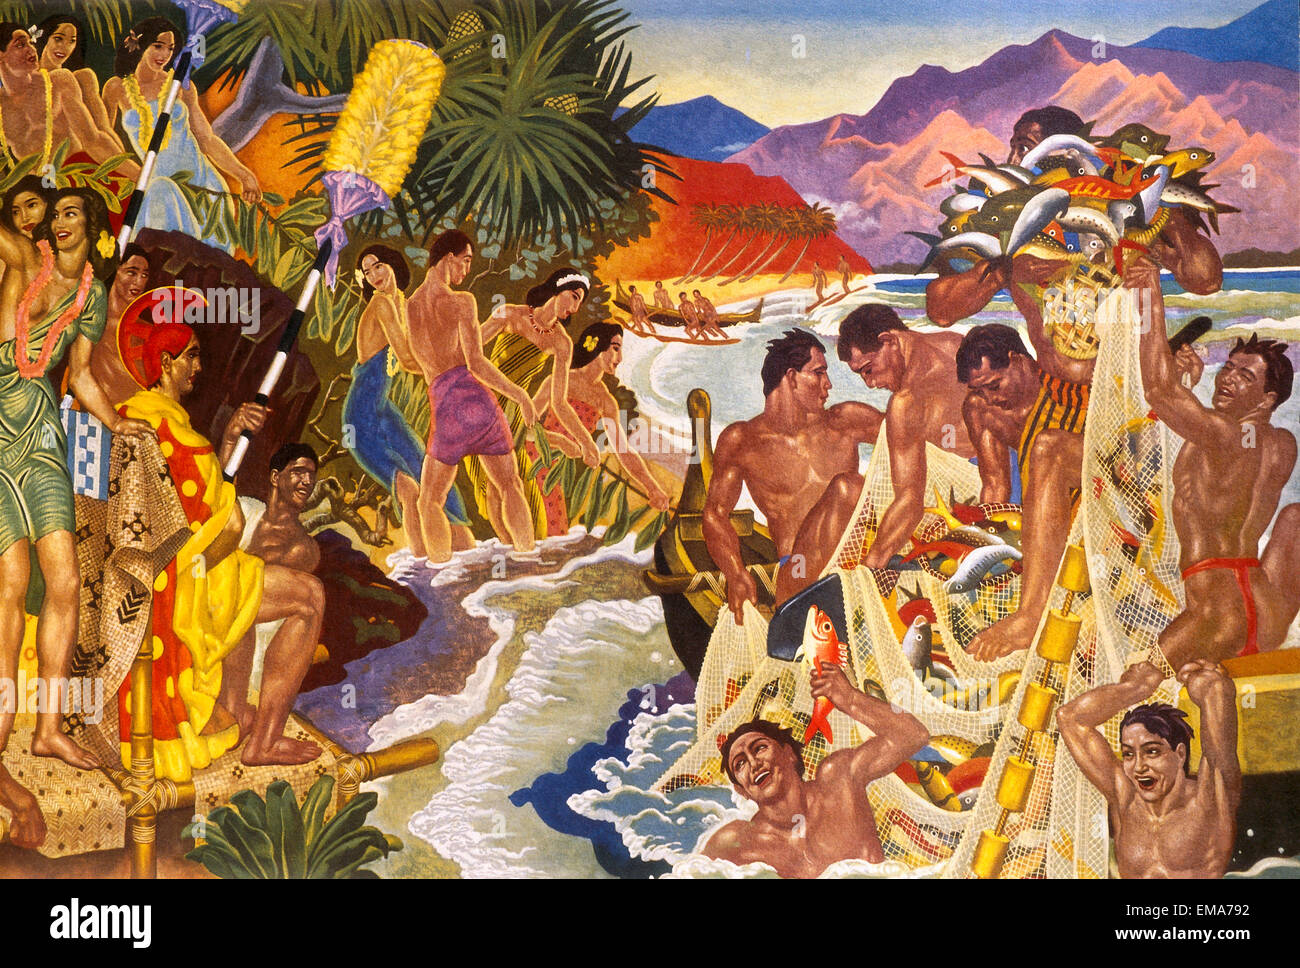 Artwork depicting primitive pacific islanders fishing on the coast Stock Photo